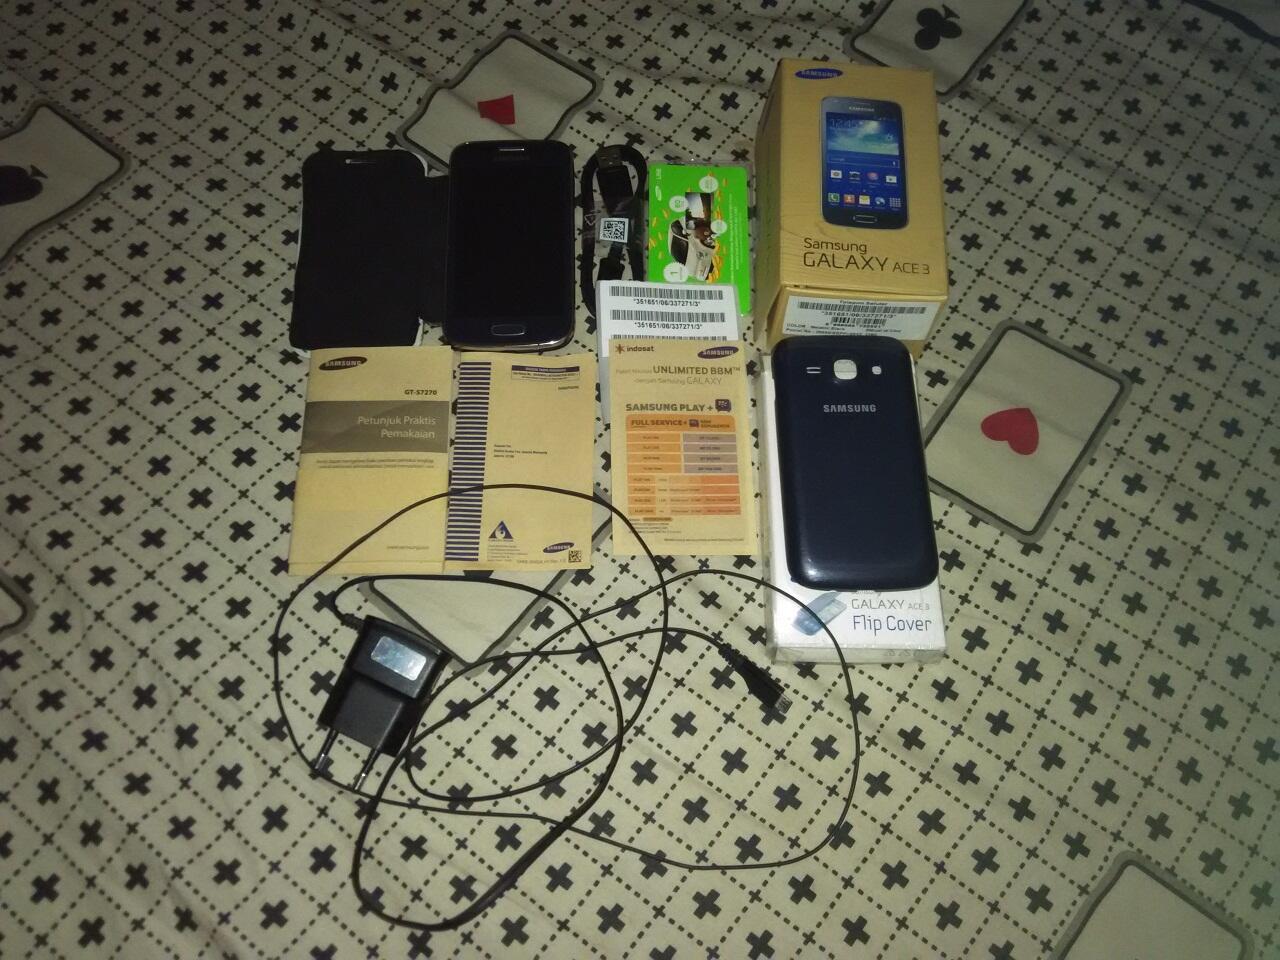 Samsung Galaxy Ace 3 Metallic Black Fullset Jakarta Selatan